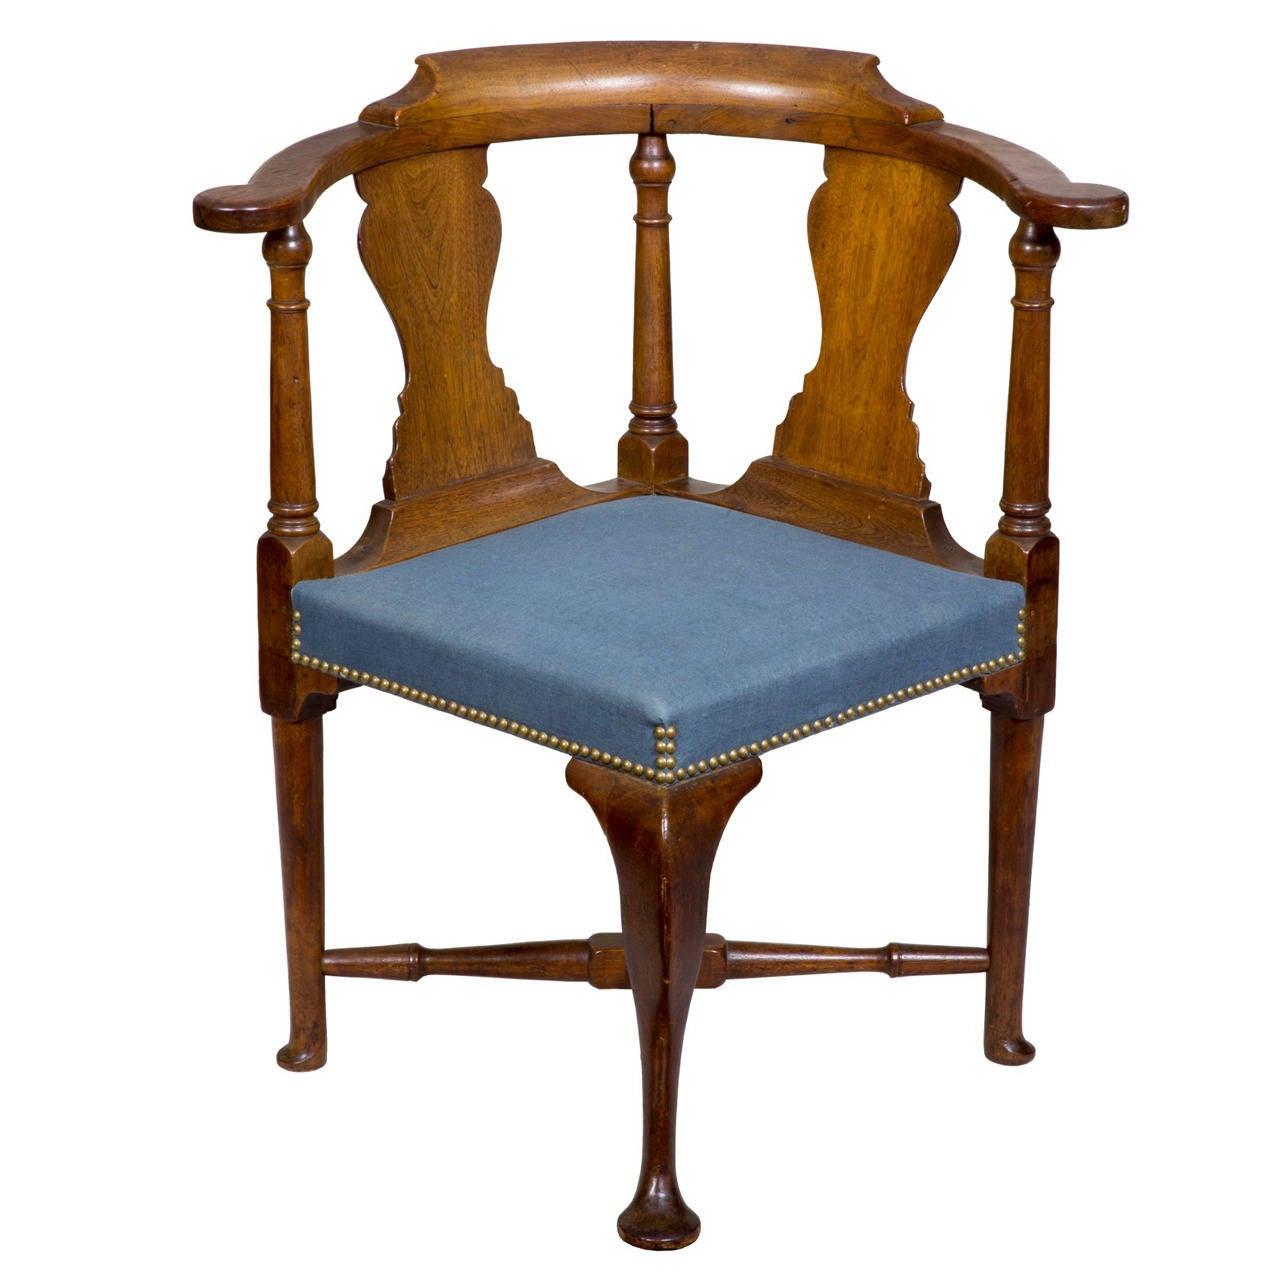 Early Queen Anne Walnut Corner Chair, Massachusetts, circa 1750